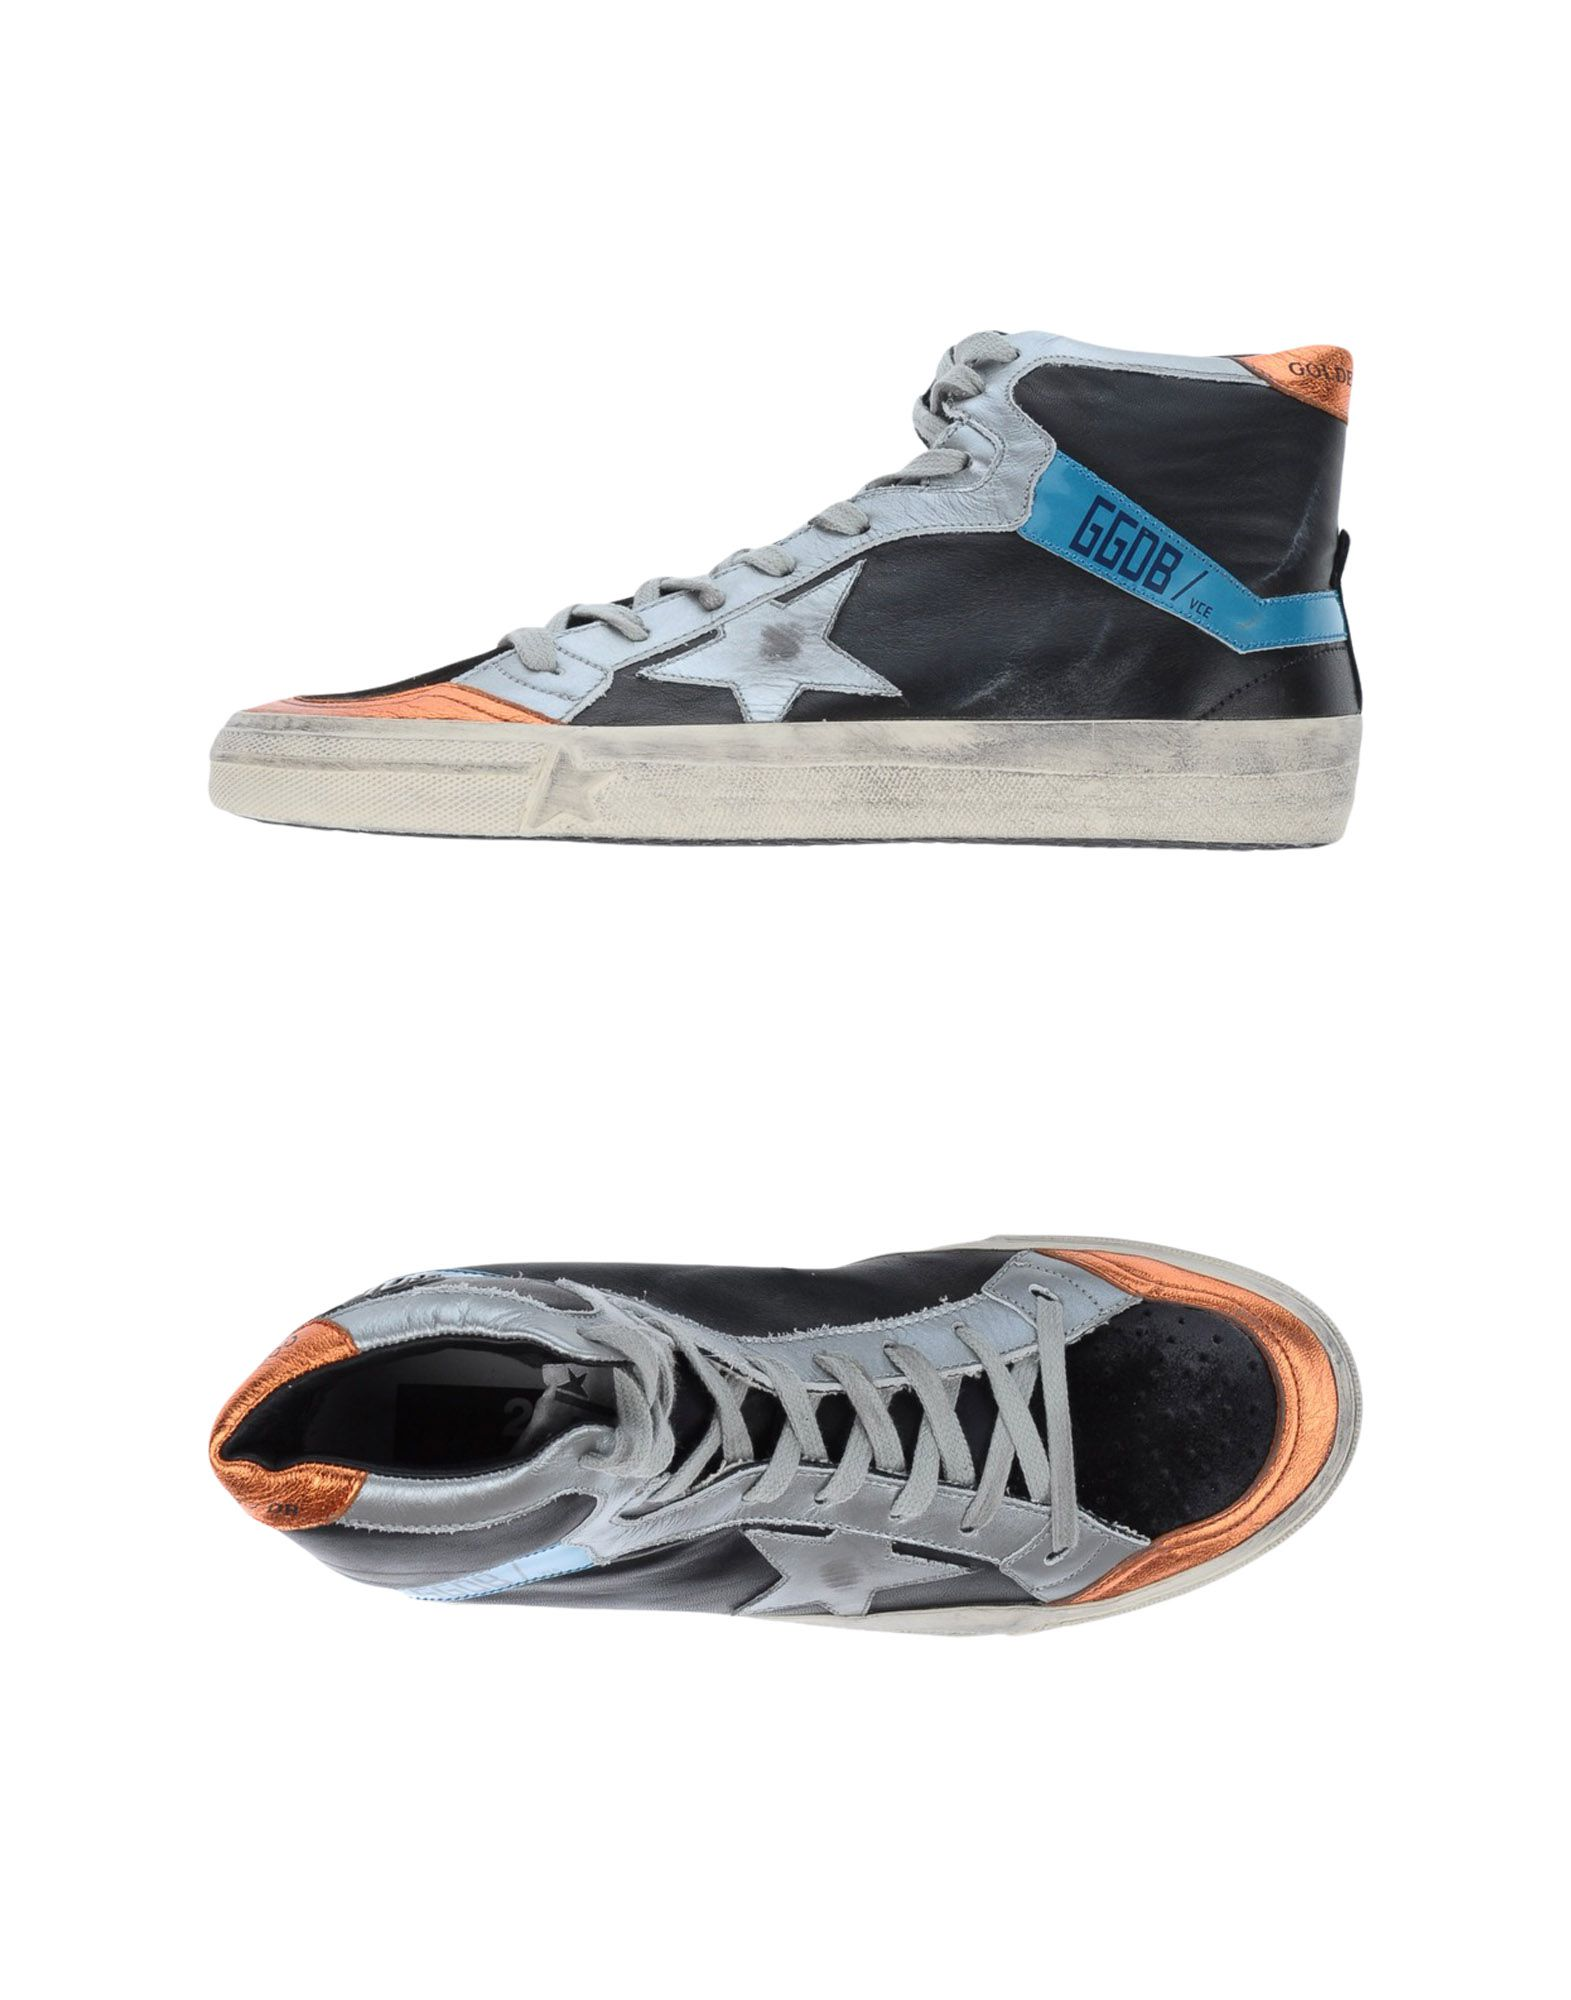 GOLDEN GOOSE DELUXE BRAND Damen High Sneakers & Tennisschuhe Farbe Schwarz Größe 3